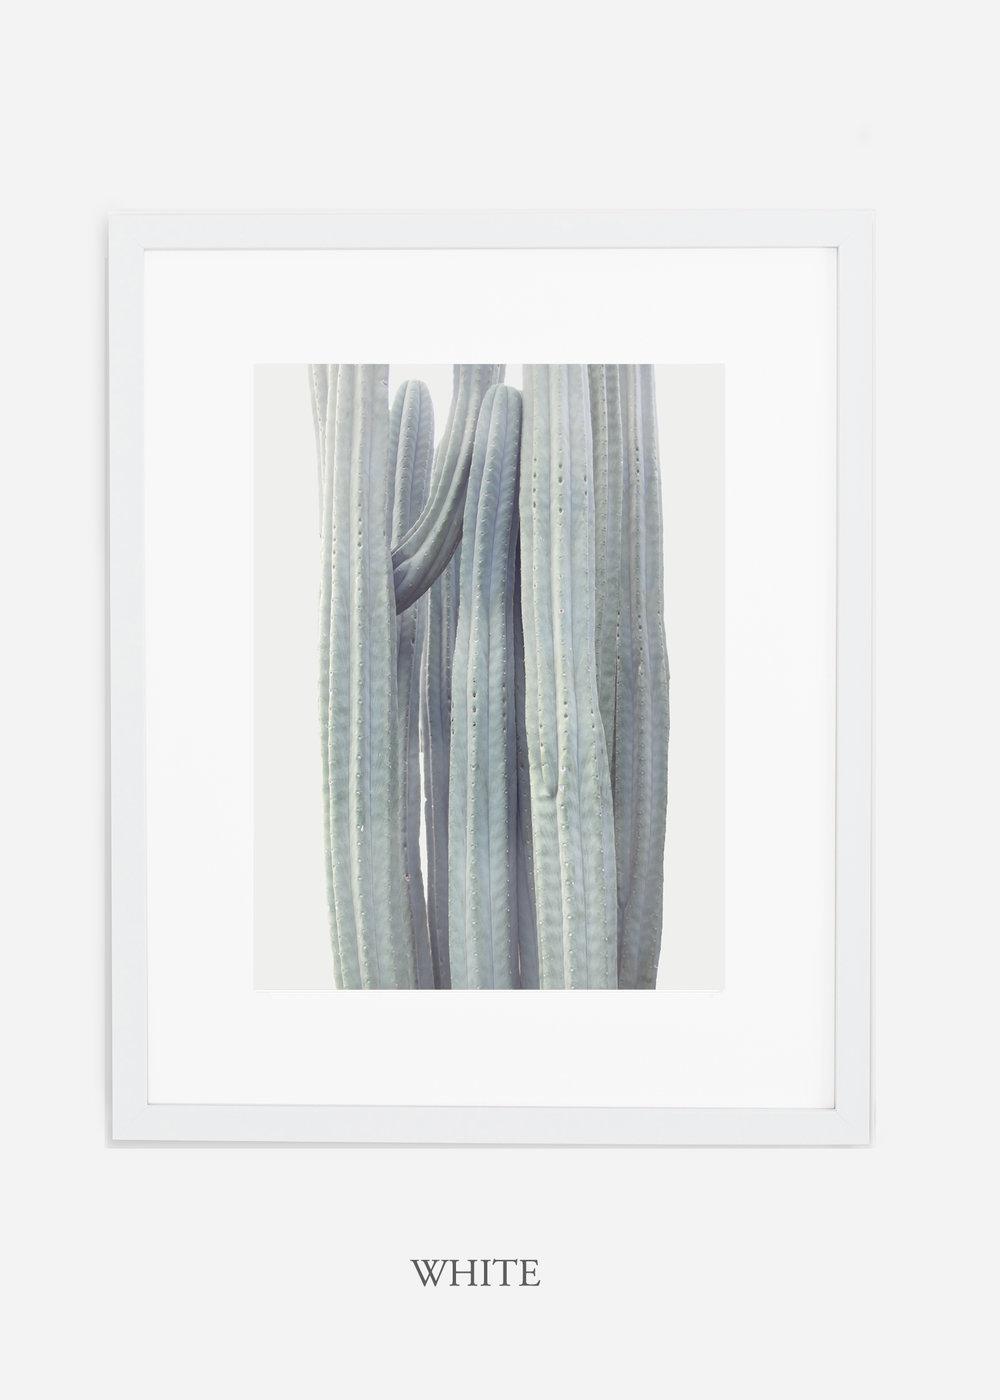 wildercalifornia_winterwhite_whiteframe_interiordesign_white_neutral_cactus_art_photography_large.jpg